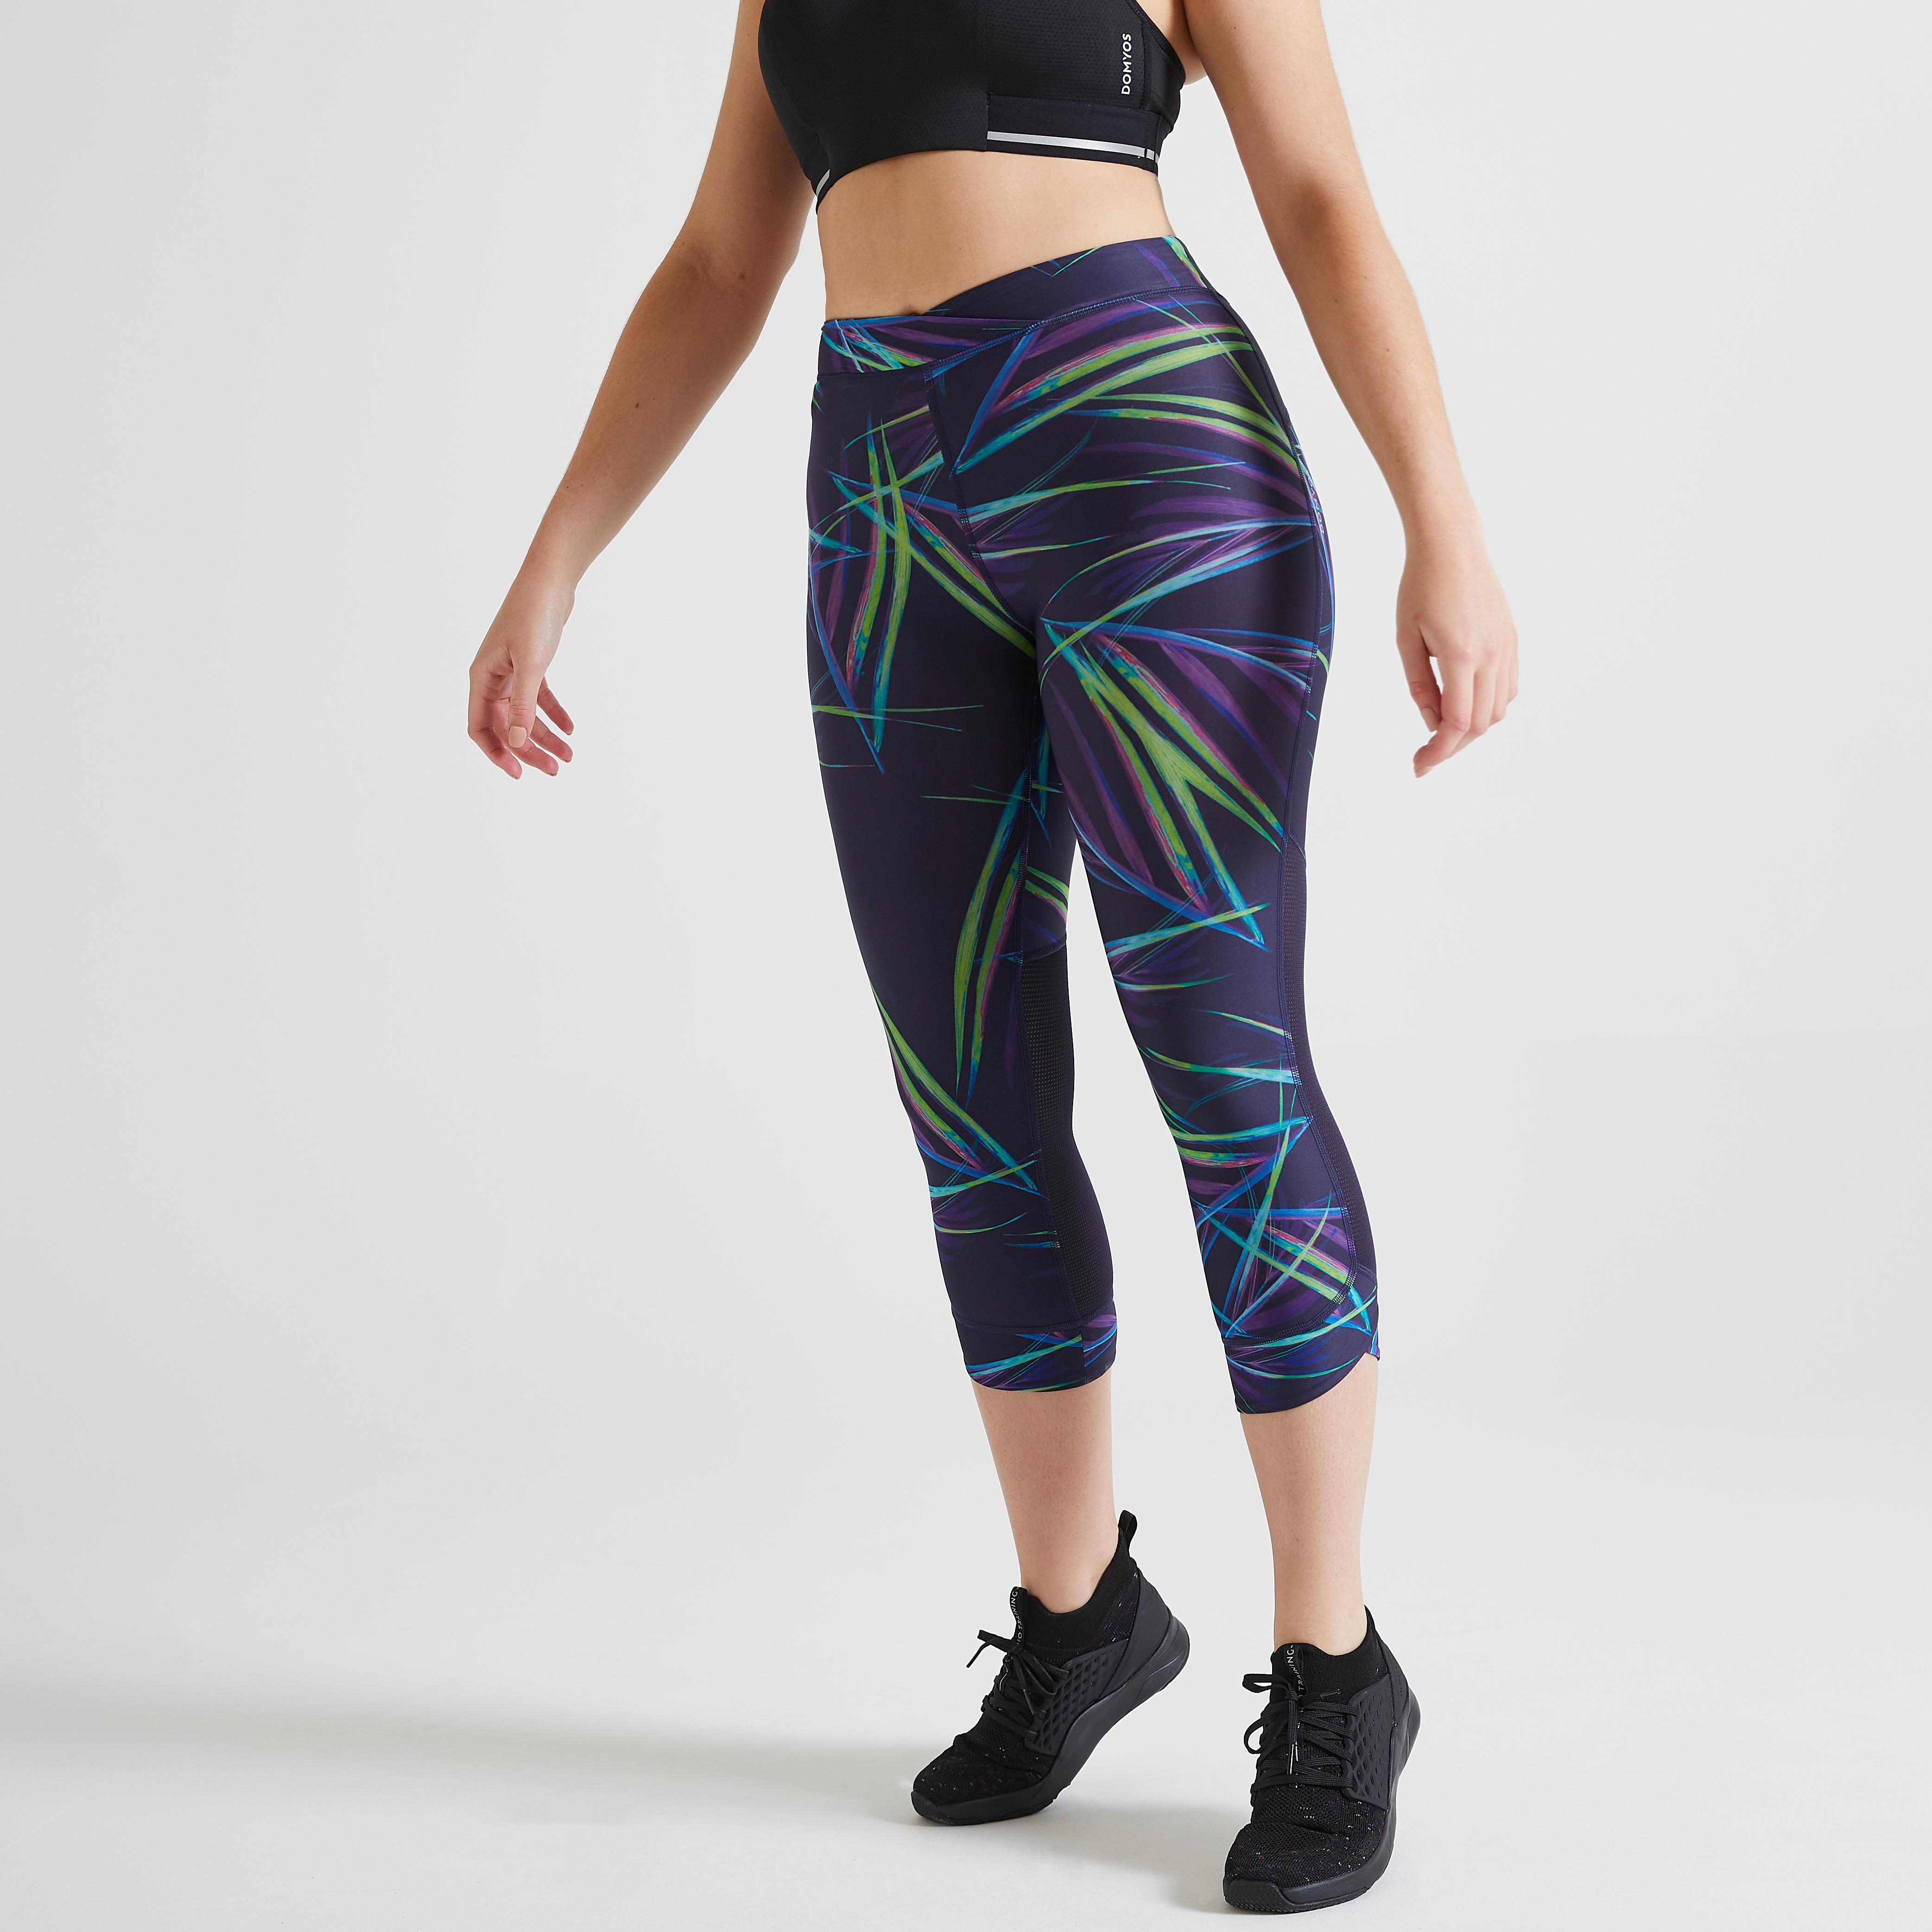 Femme Leggings Running Camping Sport Gym Pantalon Gym Cyclisme 3//4 Short influents